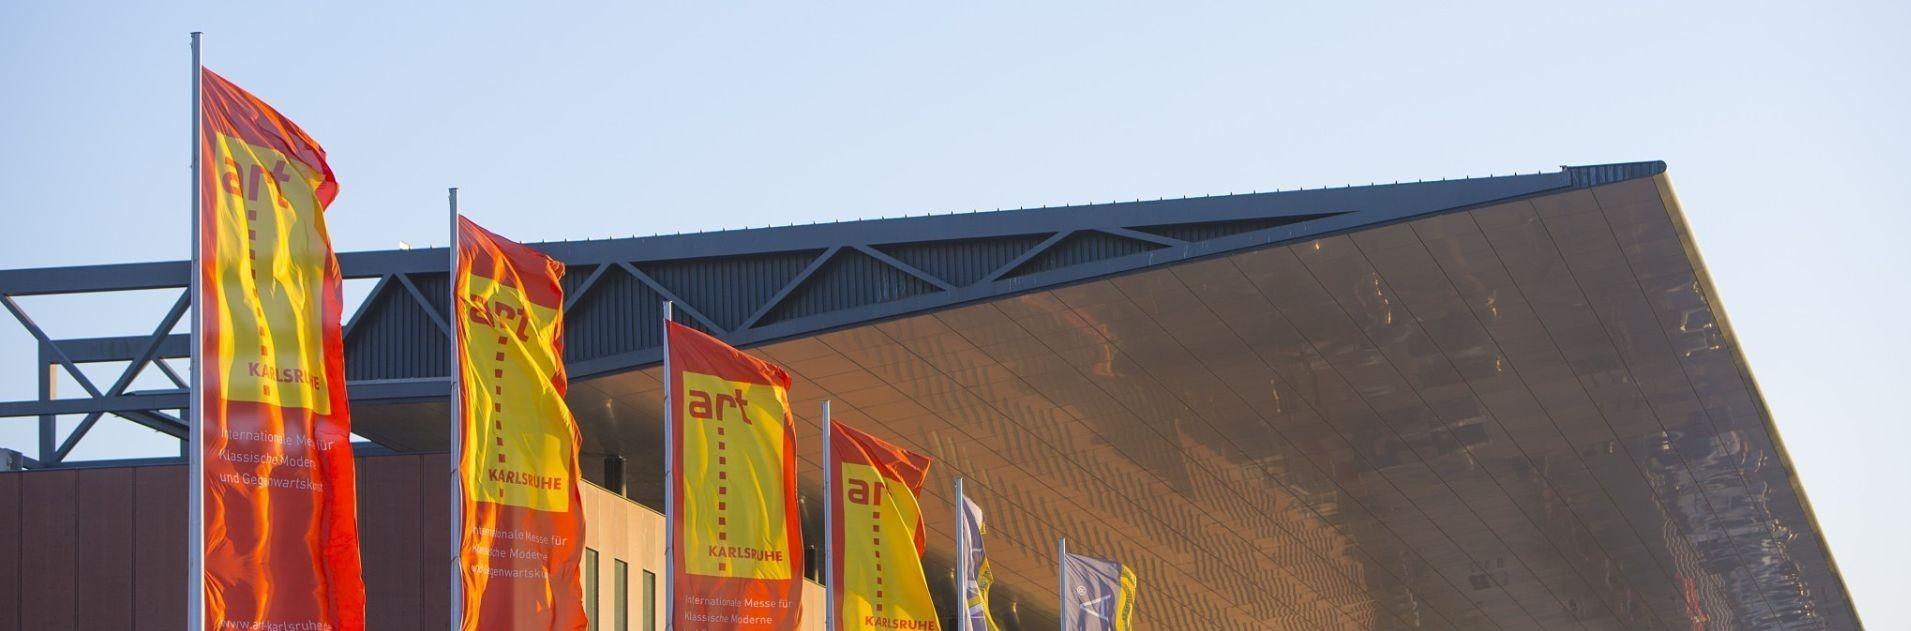 art KARLSRUHE eröffnet das Kunstmesse-Jahr